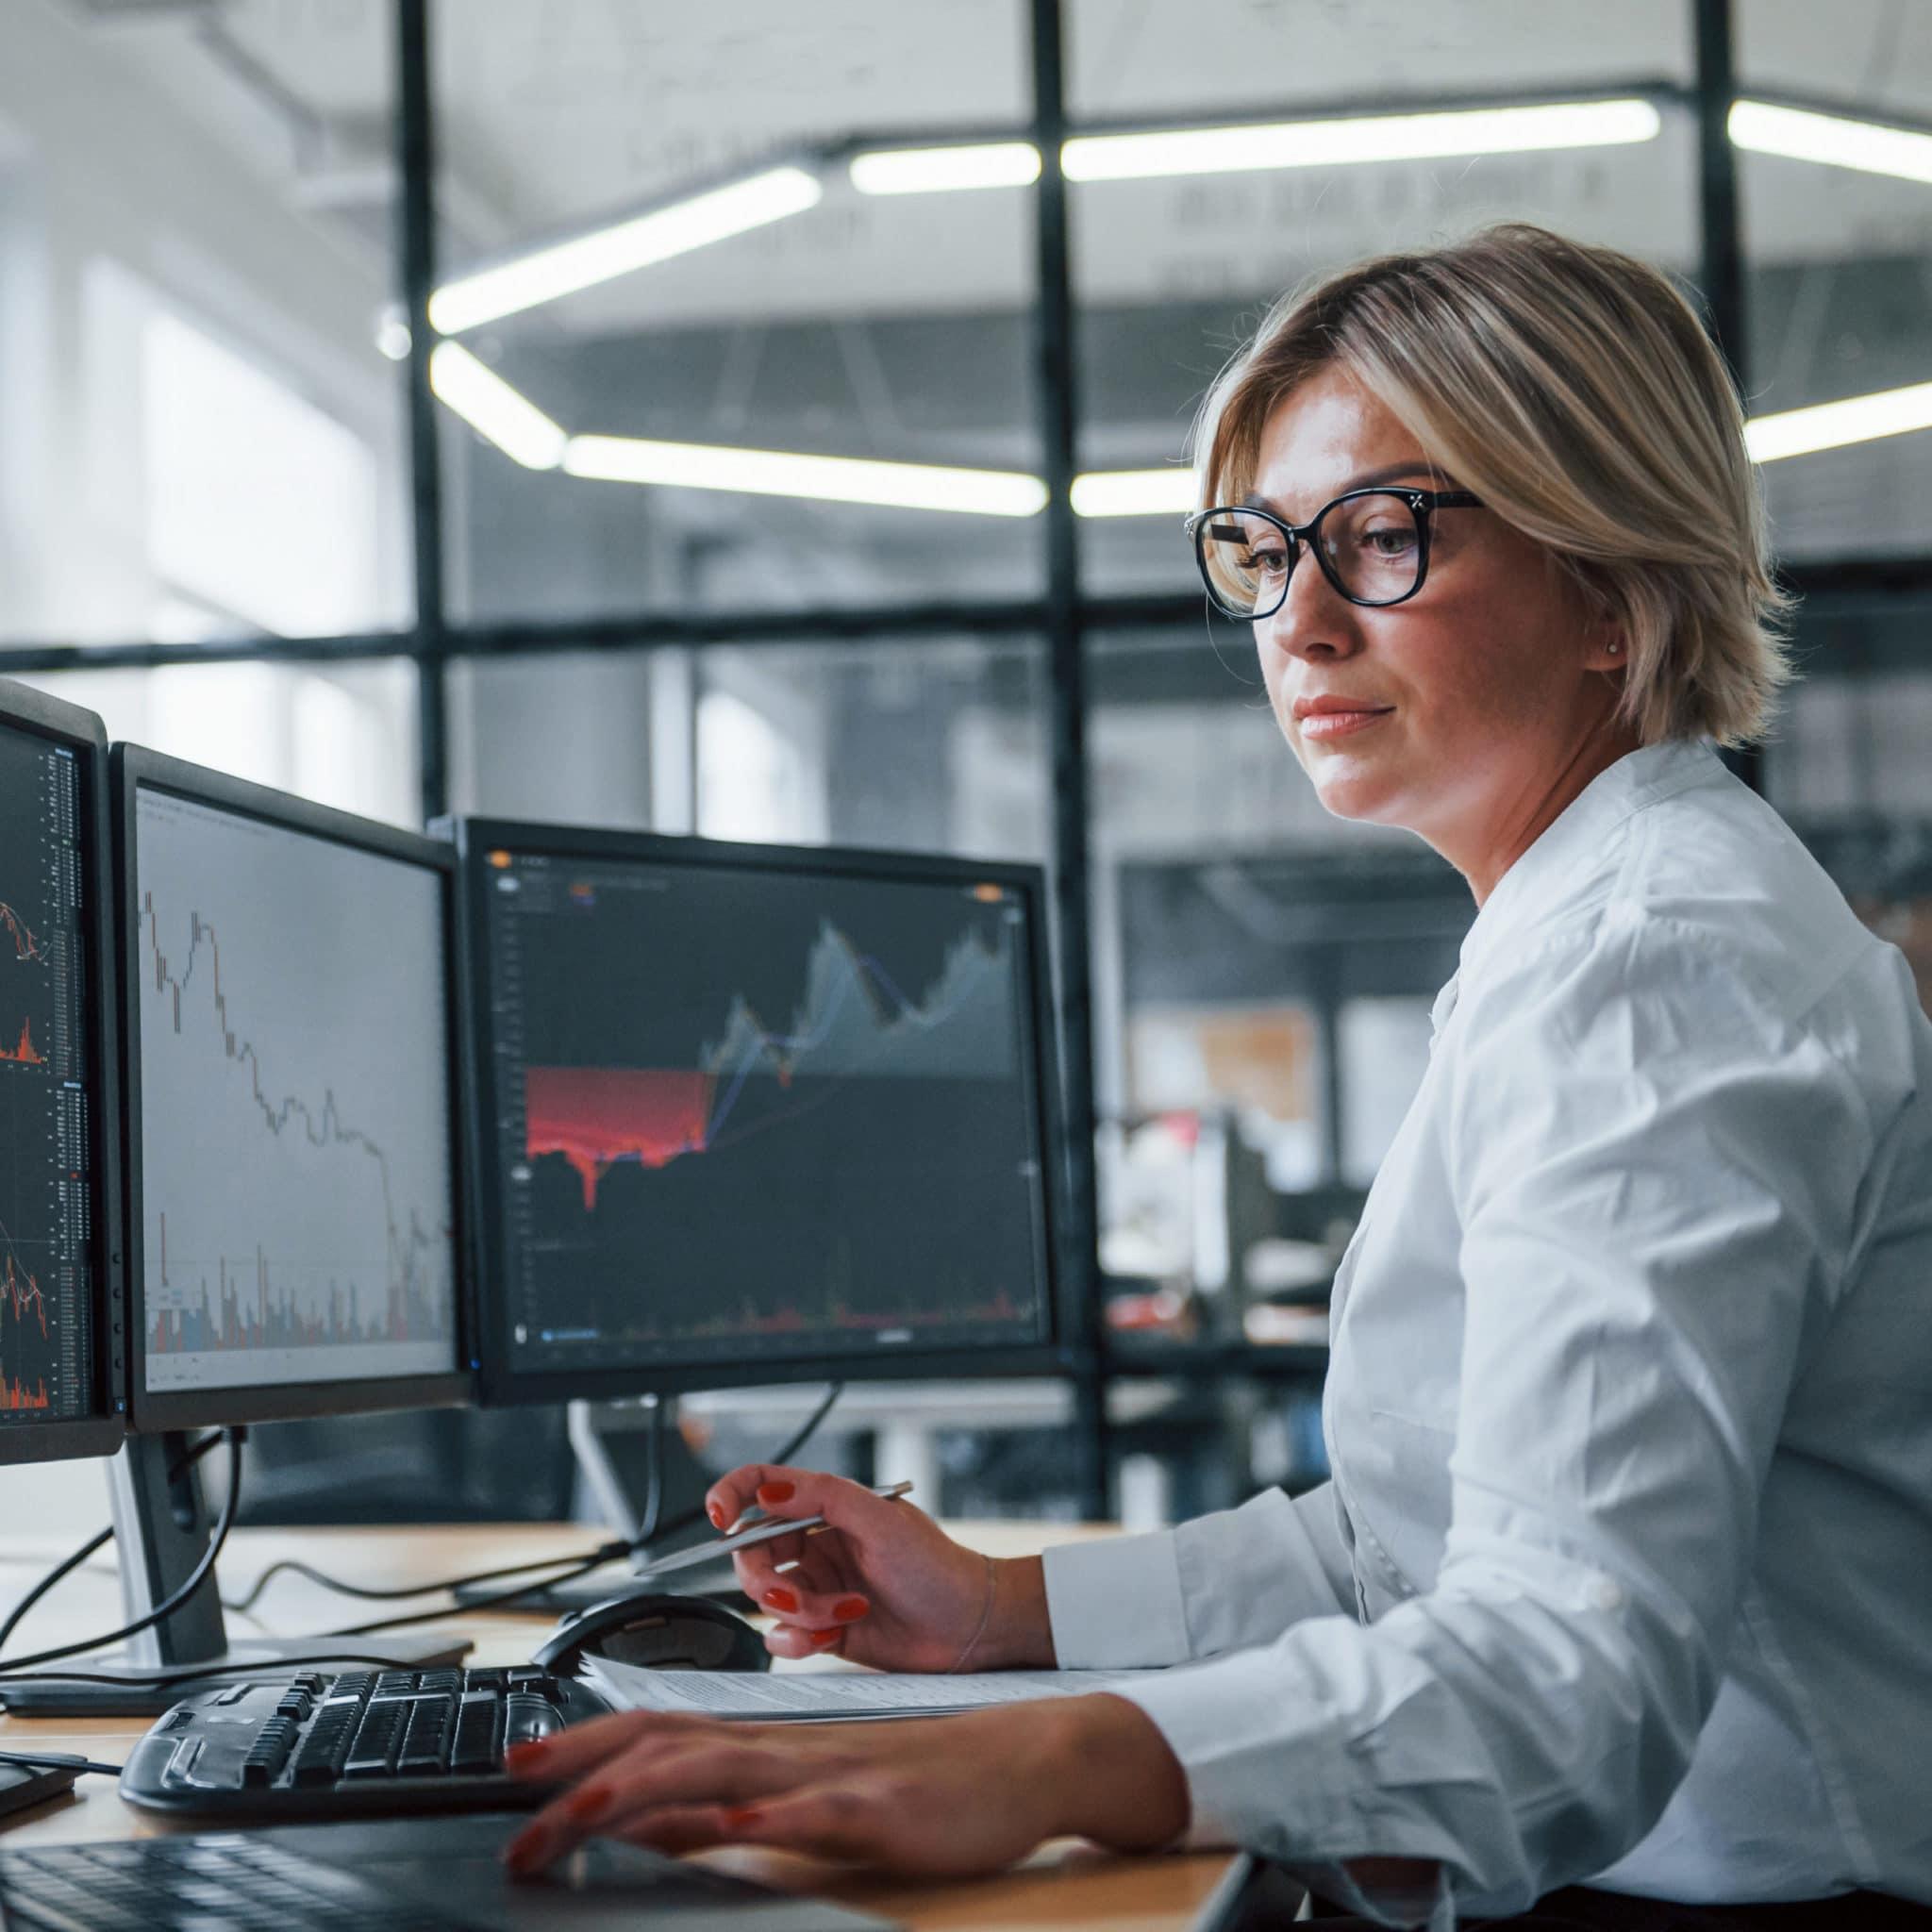 Female stockbroker wearing glasses working on laptop computer beside monitors displaying graphs.